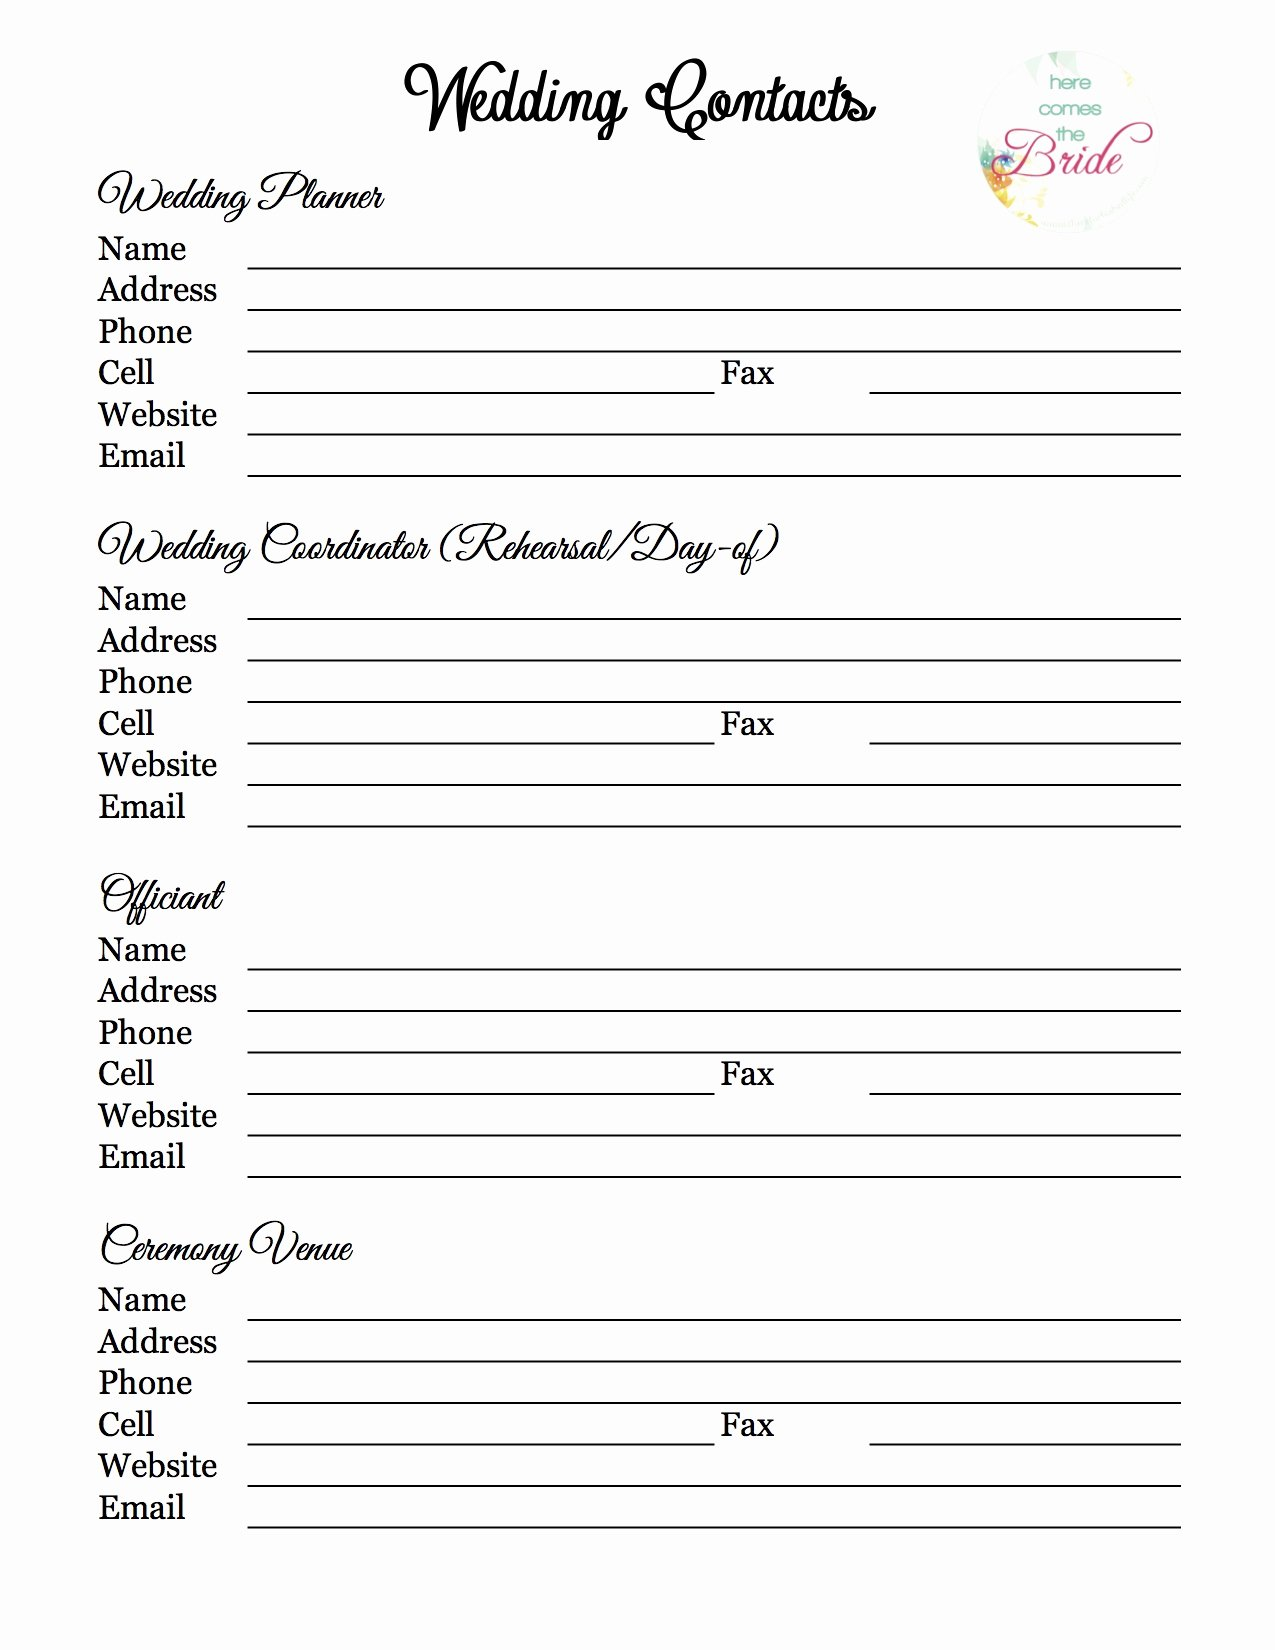 Wedding Vendor List Template Beautiful Wedding Planner with Free Printables – Refurbished